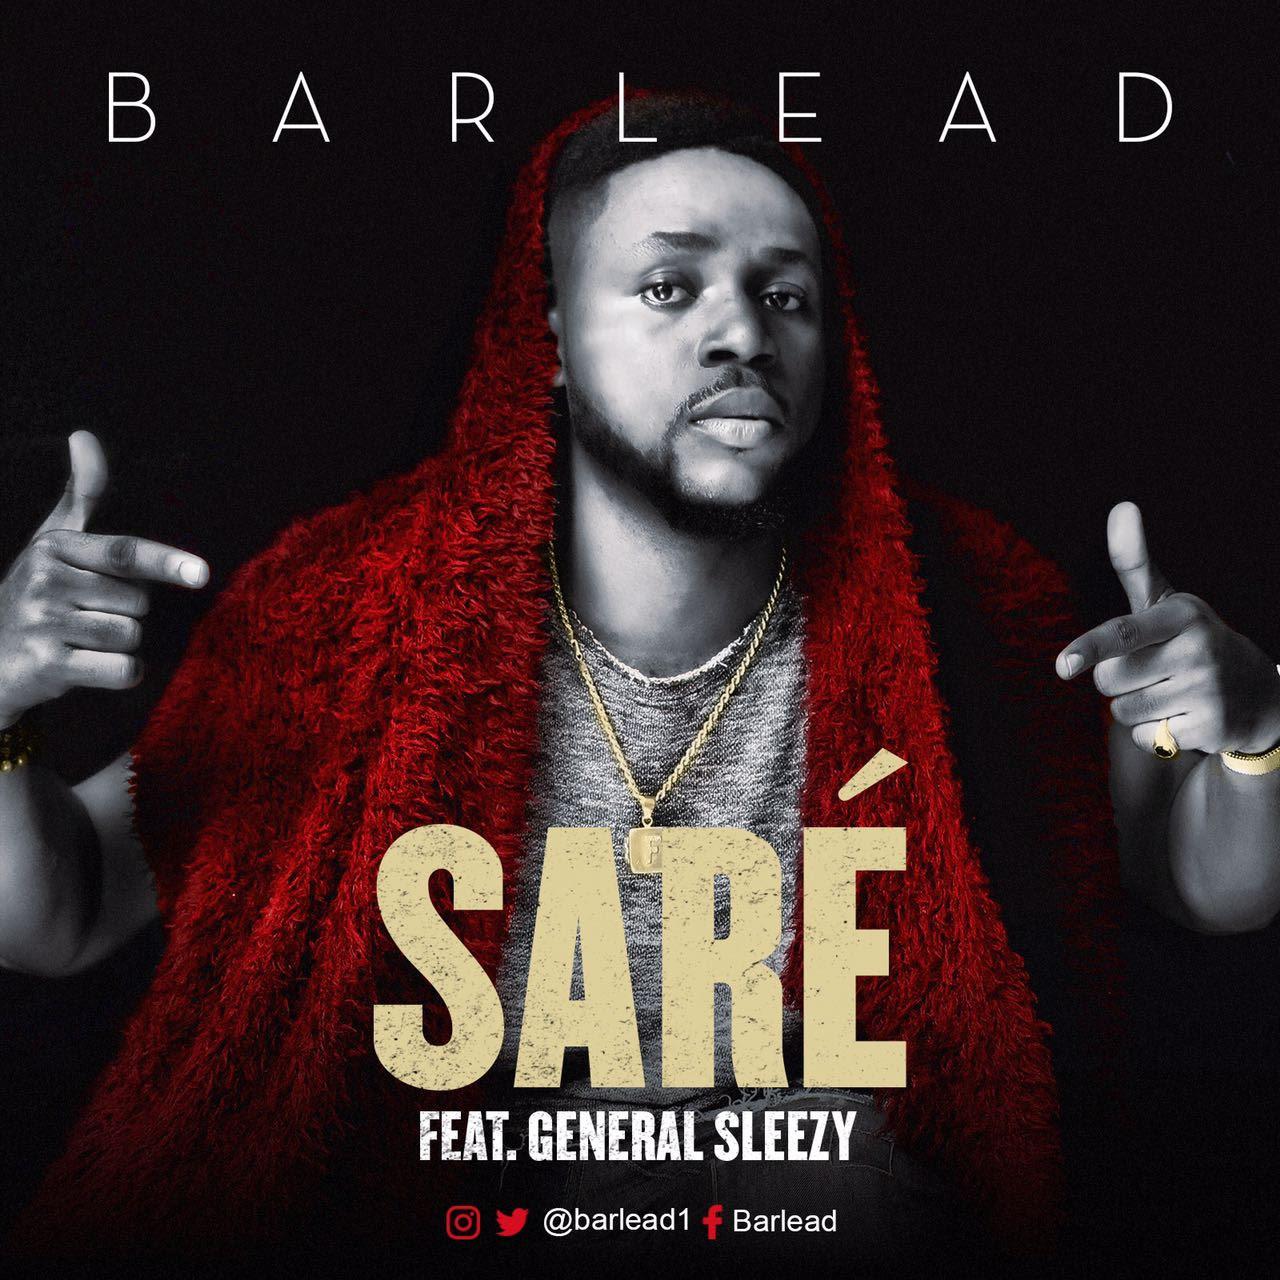 VIDEO: Barlead ft. General Sleezy – Sare